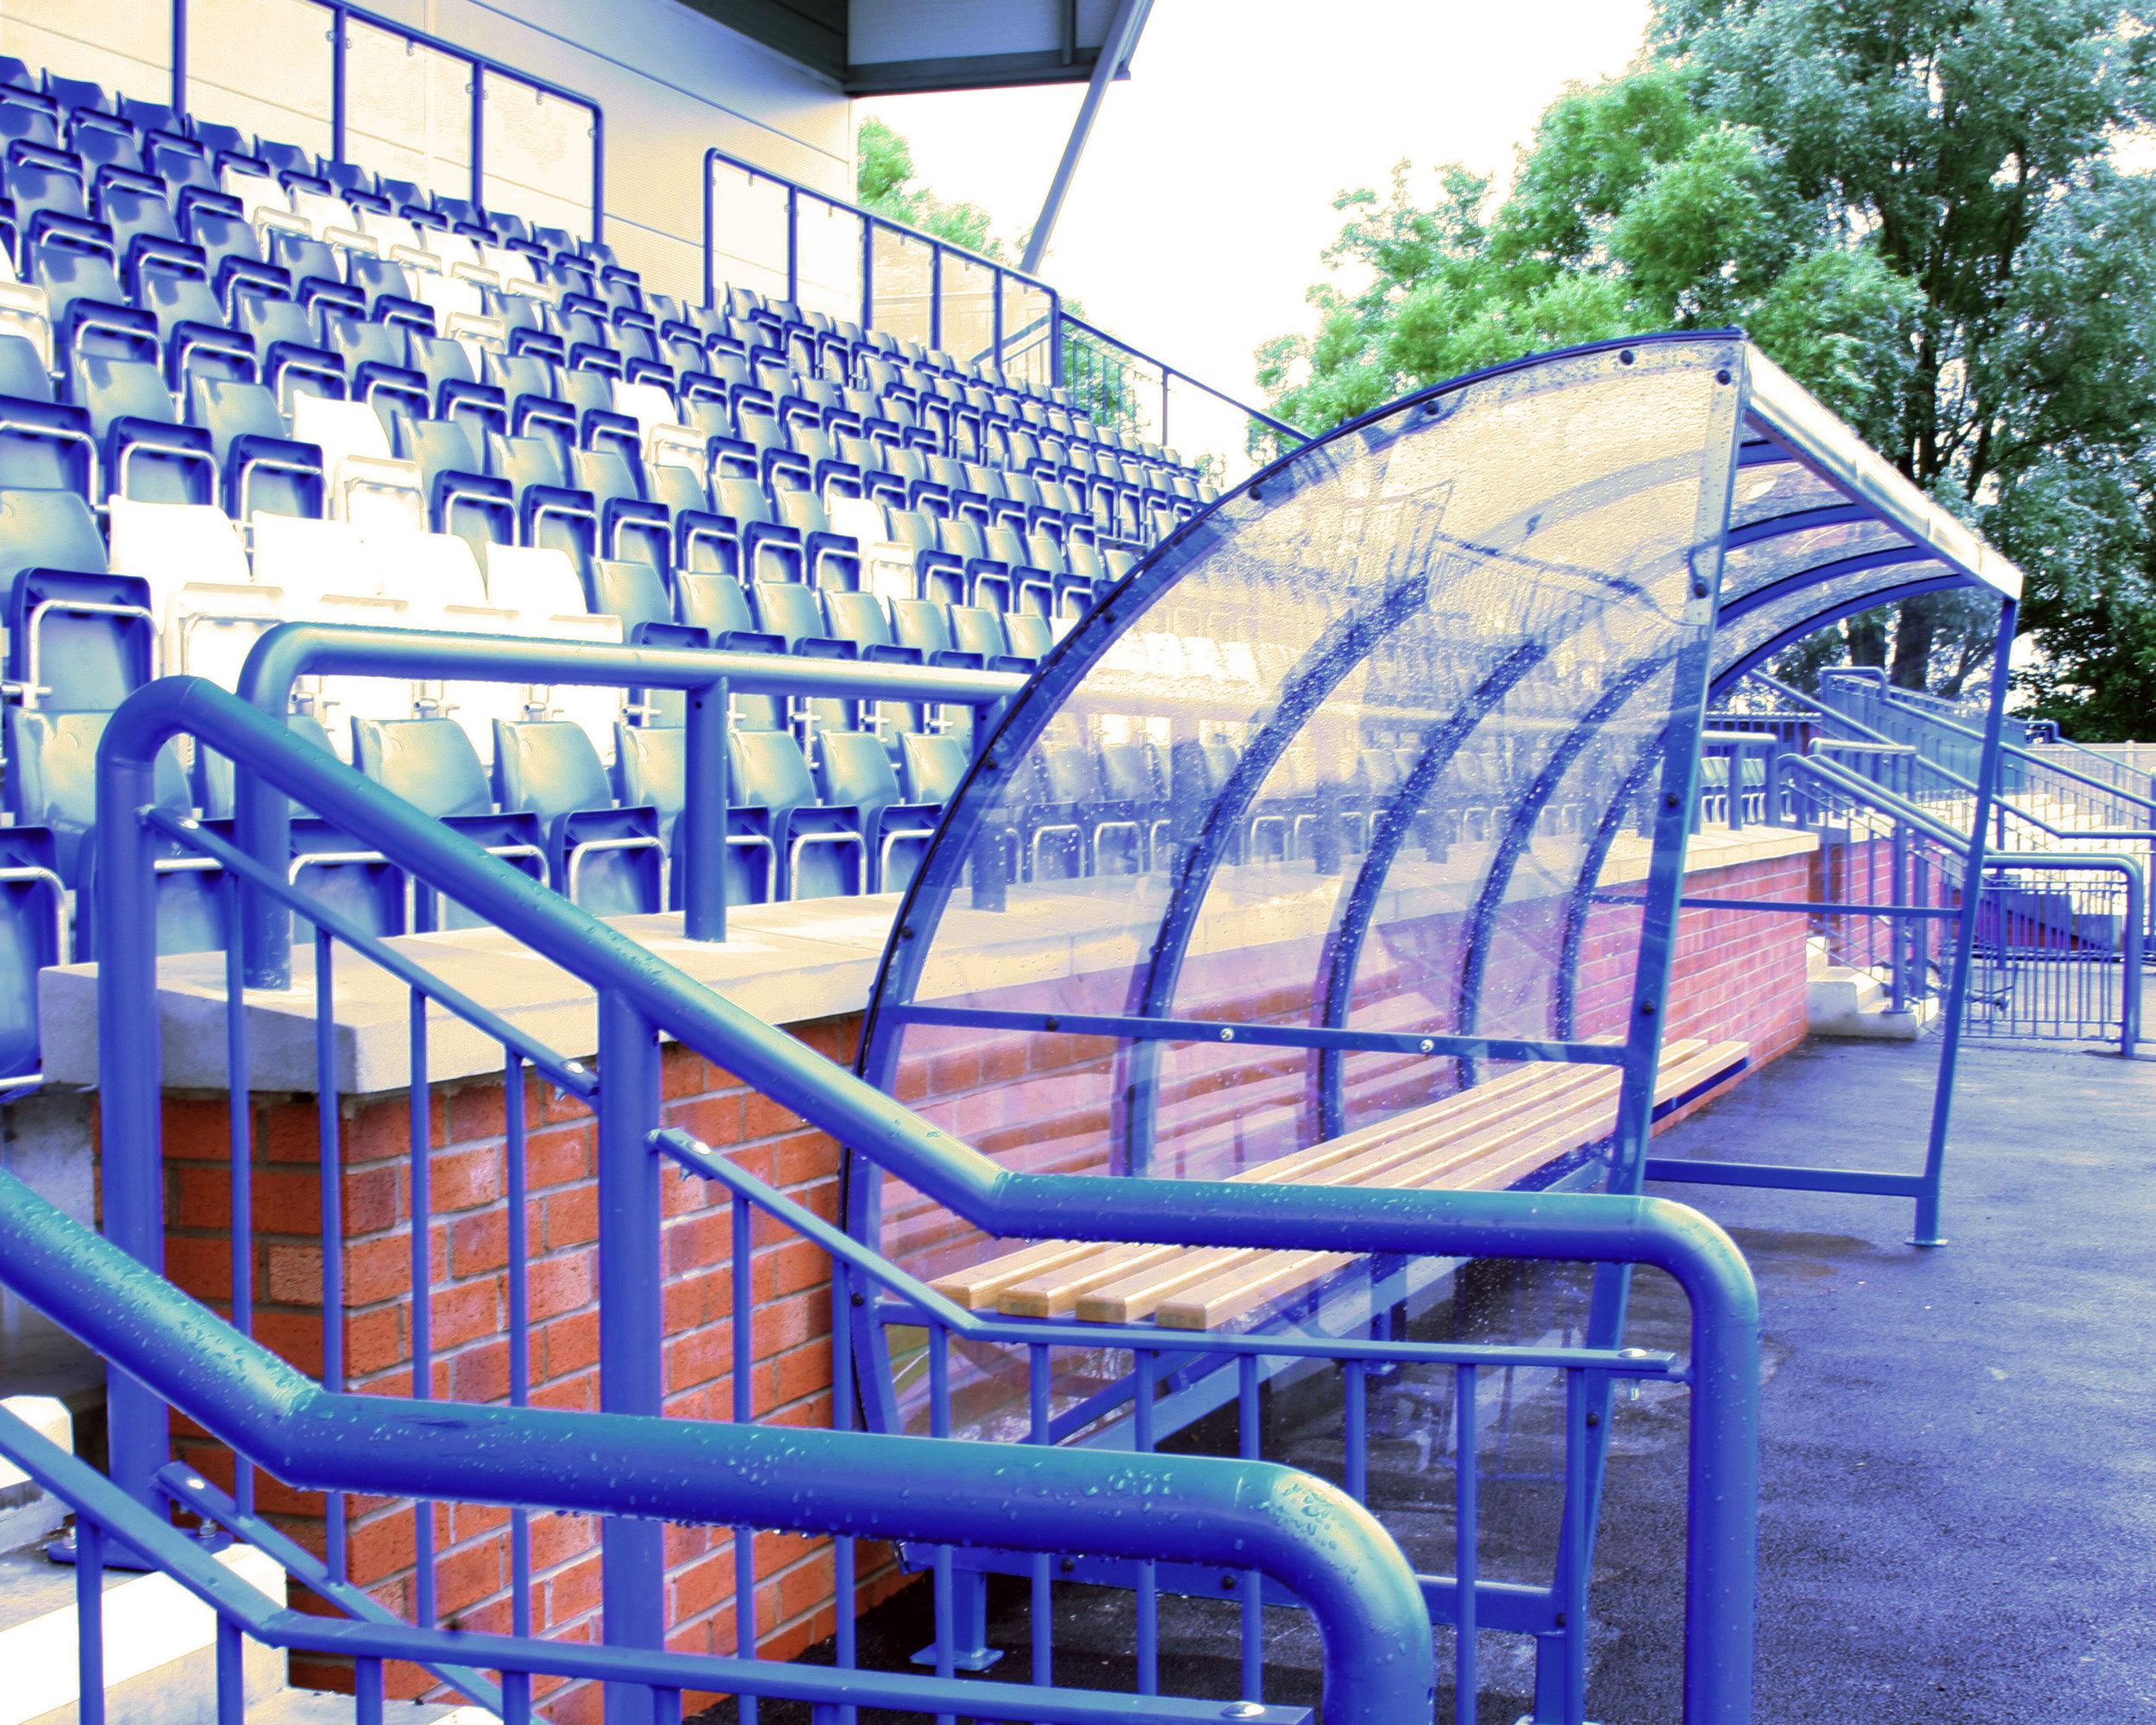 Curzon Football Stadium, Ashton-Under-Lyne